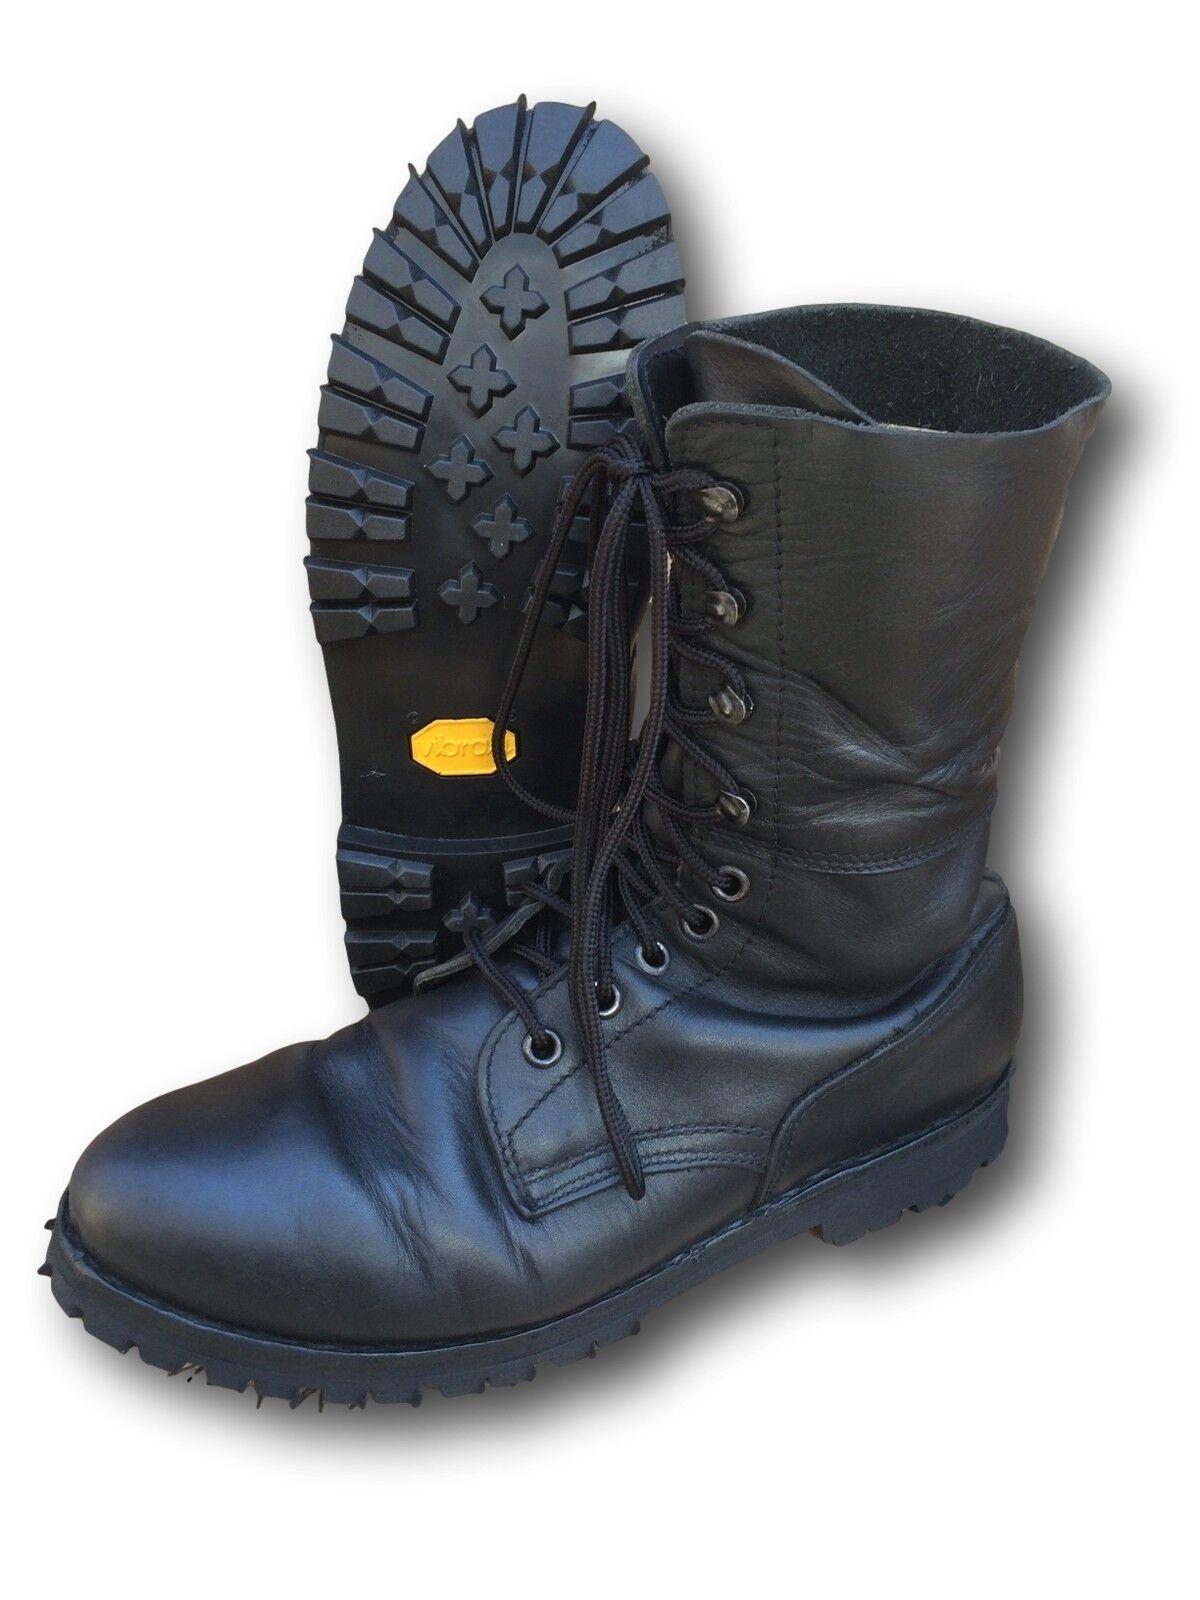 Austrian German Unlined Paratrooper Stiefel, Reconditioned,new vibram soles